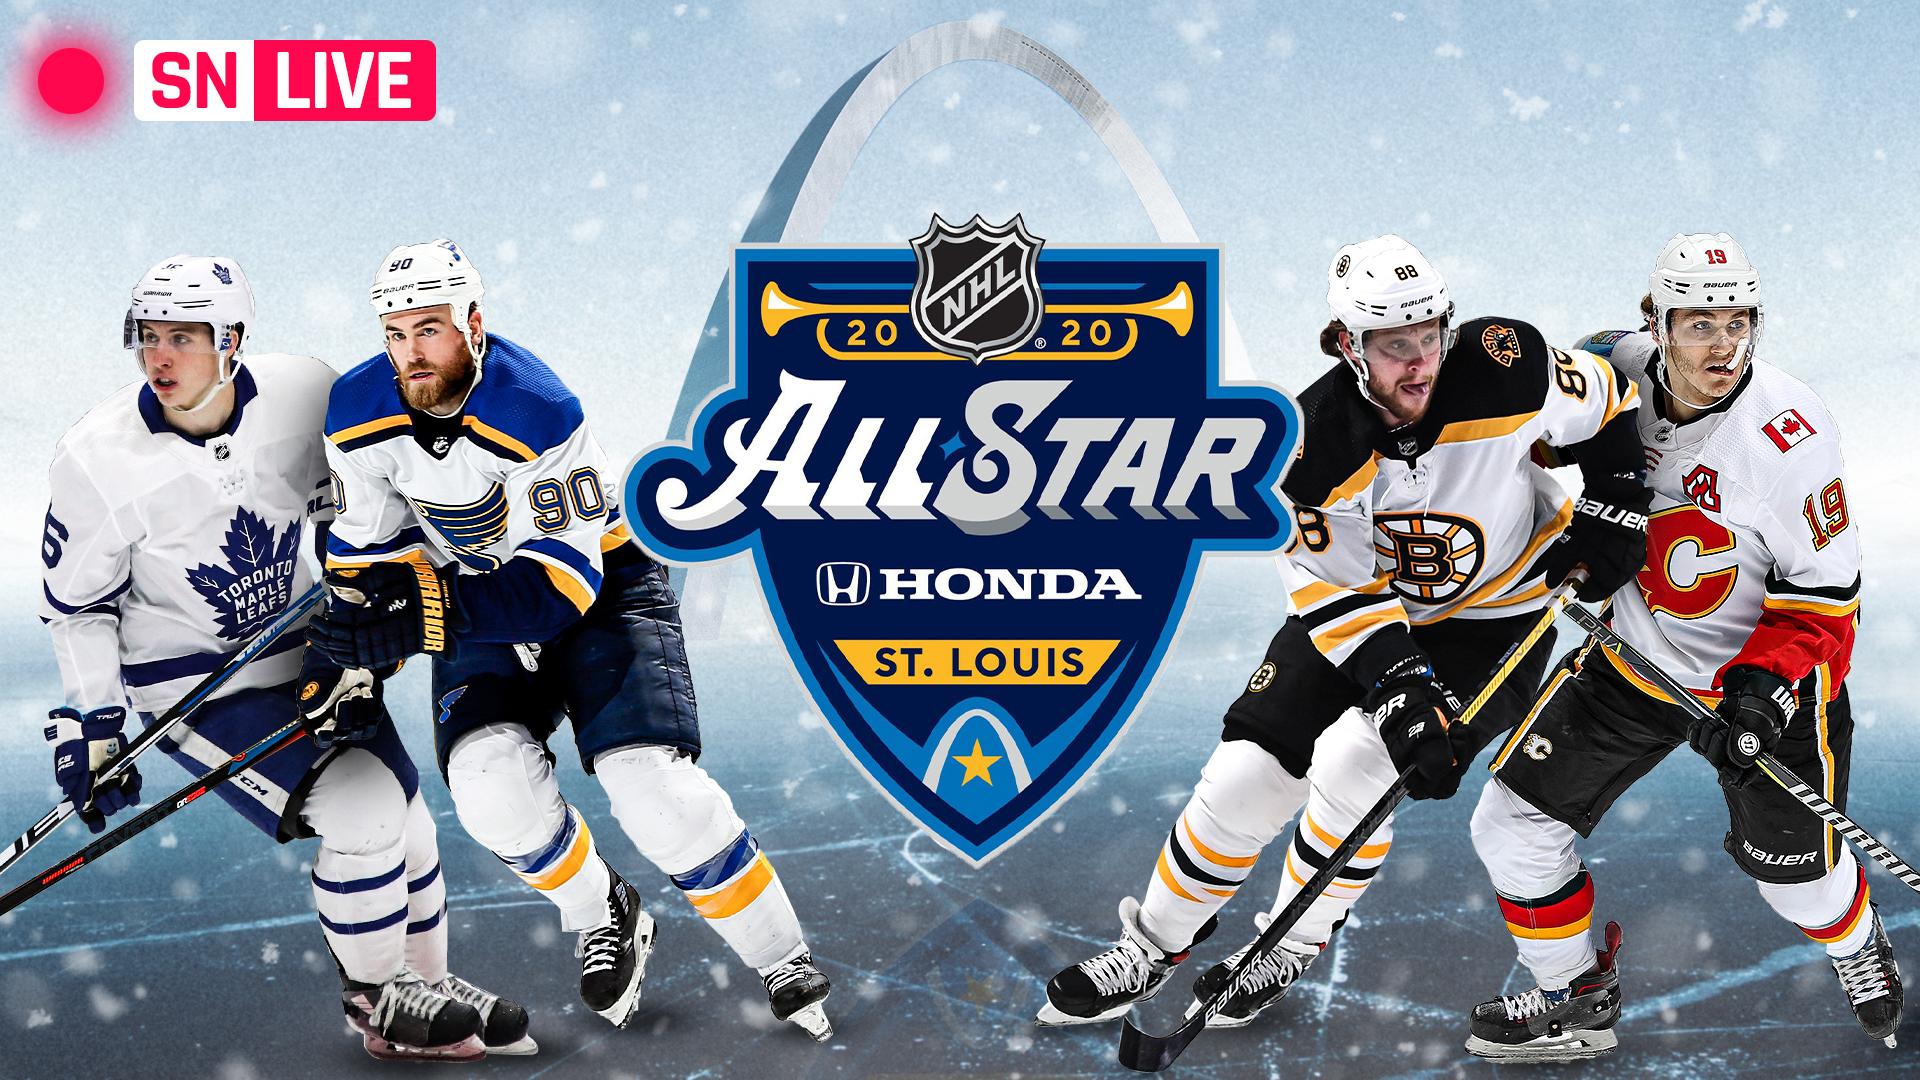 Nhl-all-star-game-2020-live-ftr_1q8uv5zn237j41tk5y2rub80ly